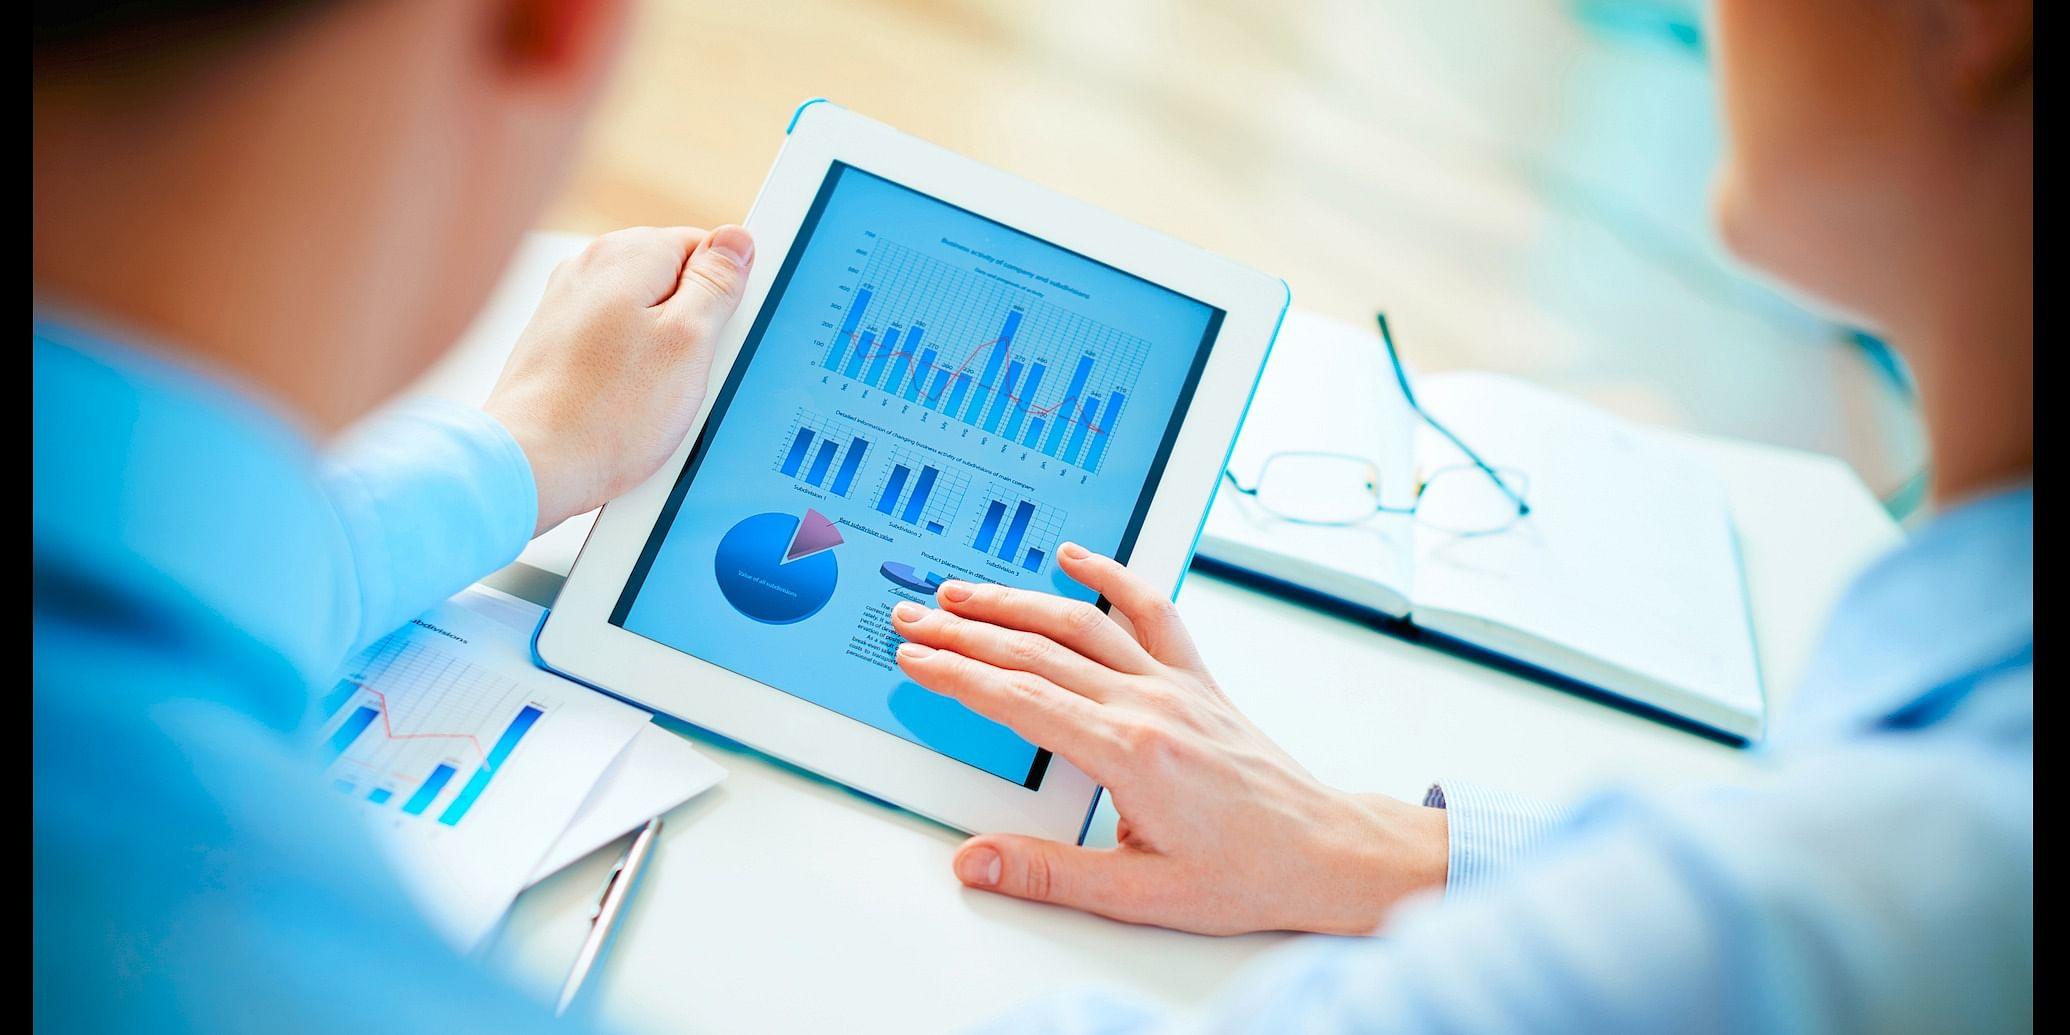 (Data Analytics as SaaS. Source: https://thenextweb.com/wp-content/blogs.dir/1/files/2014/04/data-business-meeting.jpg)